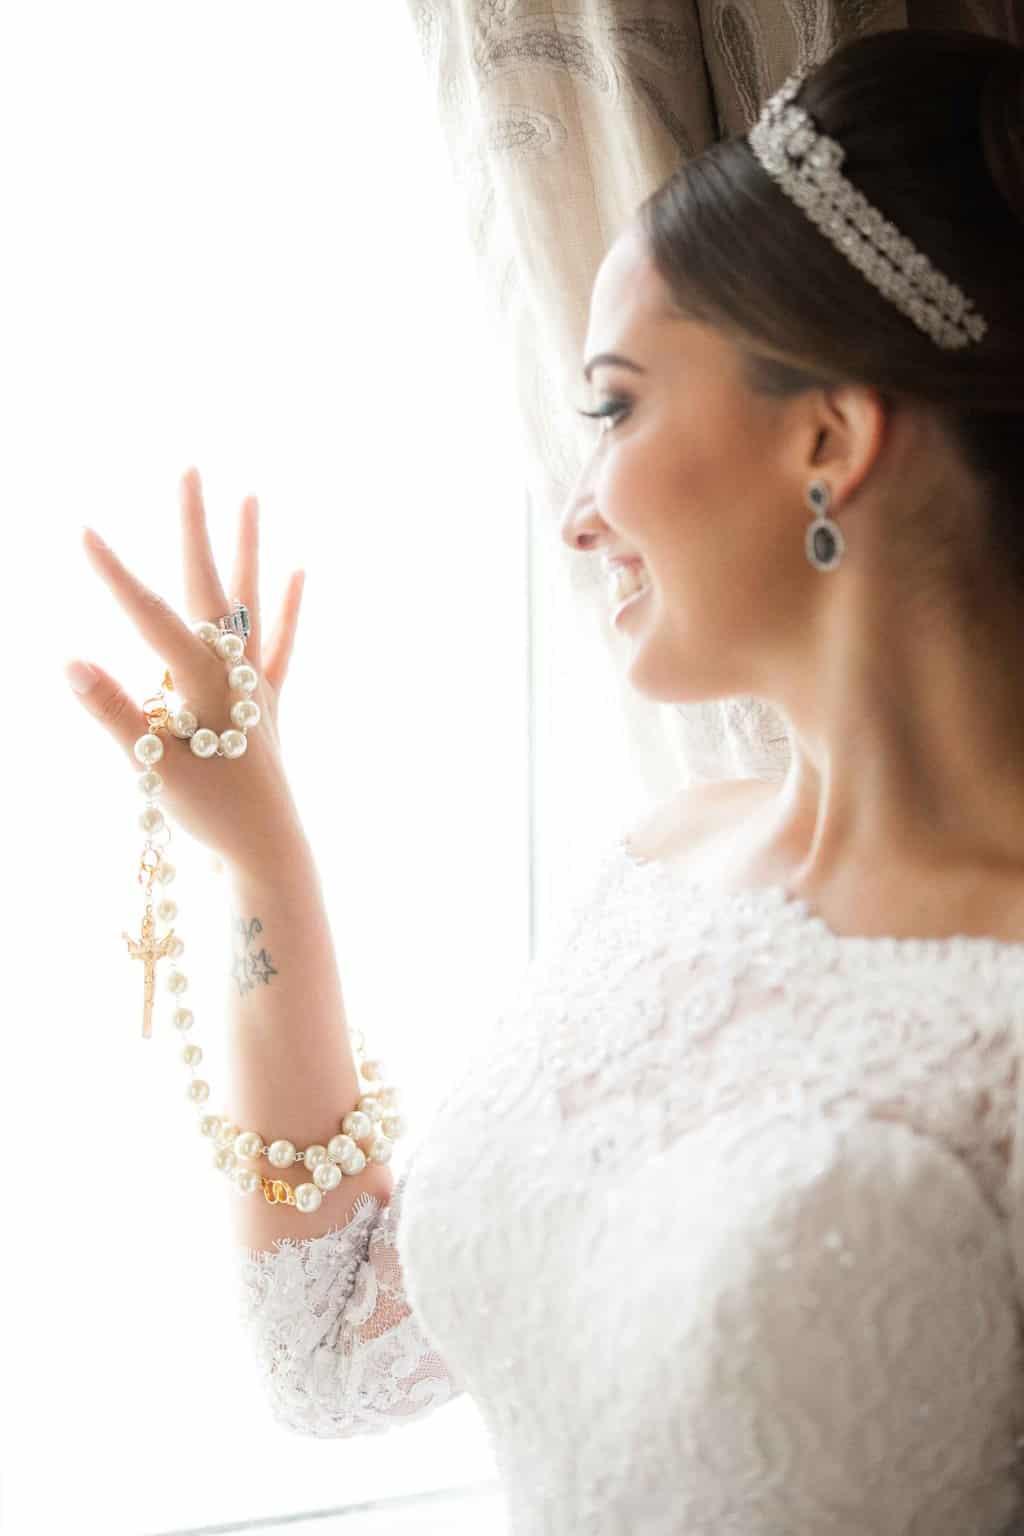 Casamento-Clássico-Casamento-tradicional-Copacabana-Palace-Monica-Roias-Poses-noiva-Ribas-Foto-e-Vídeo-Terço-Tuanny-e-Bernardo-CaseMe-2